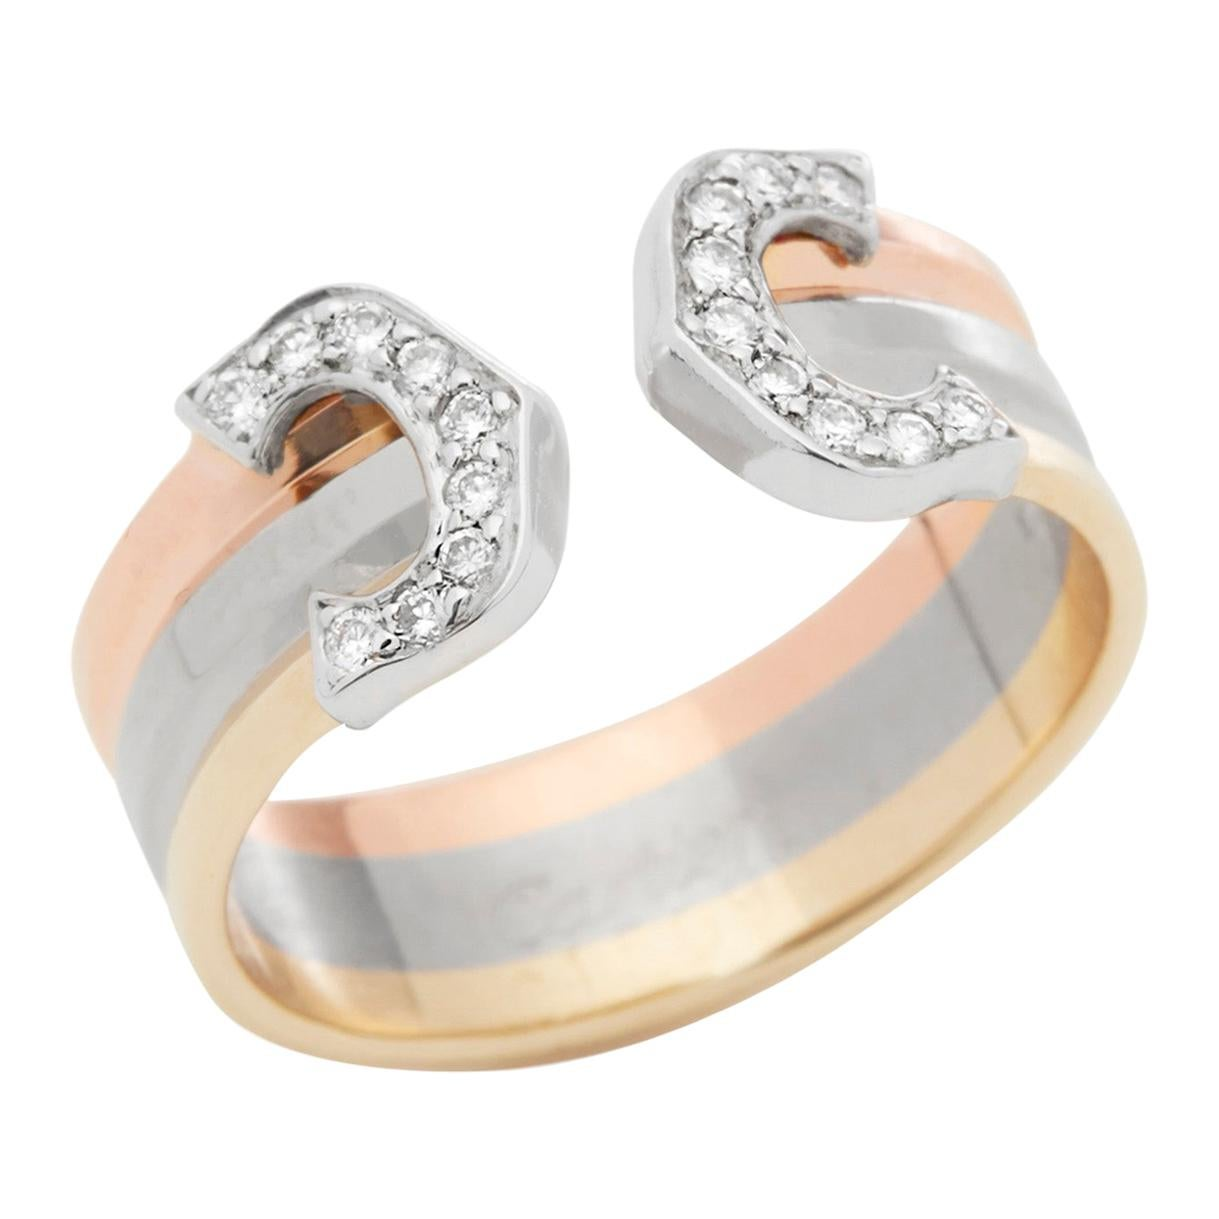 Cartier 18 Karat Yellow, White and Rose Gold C De Cartier Diamond Ring